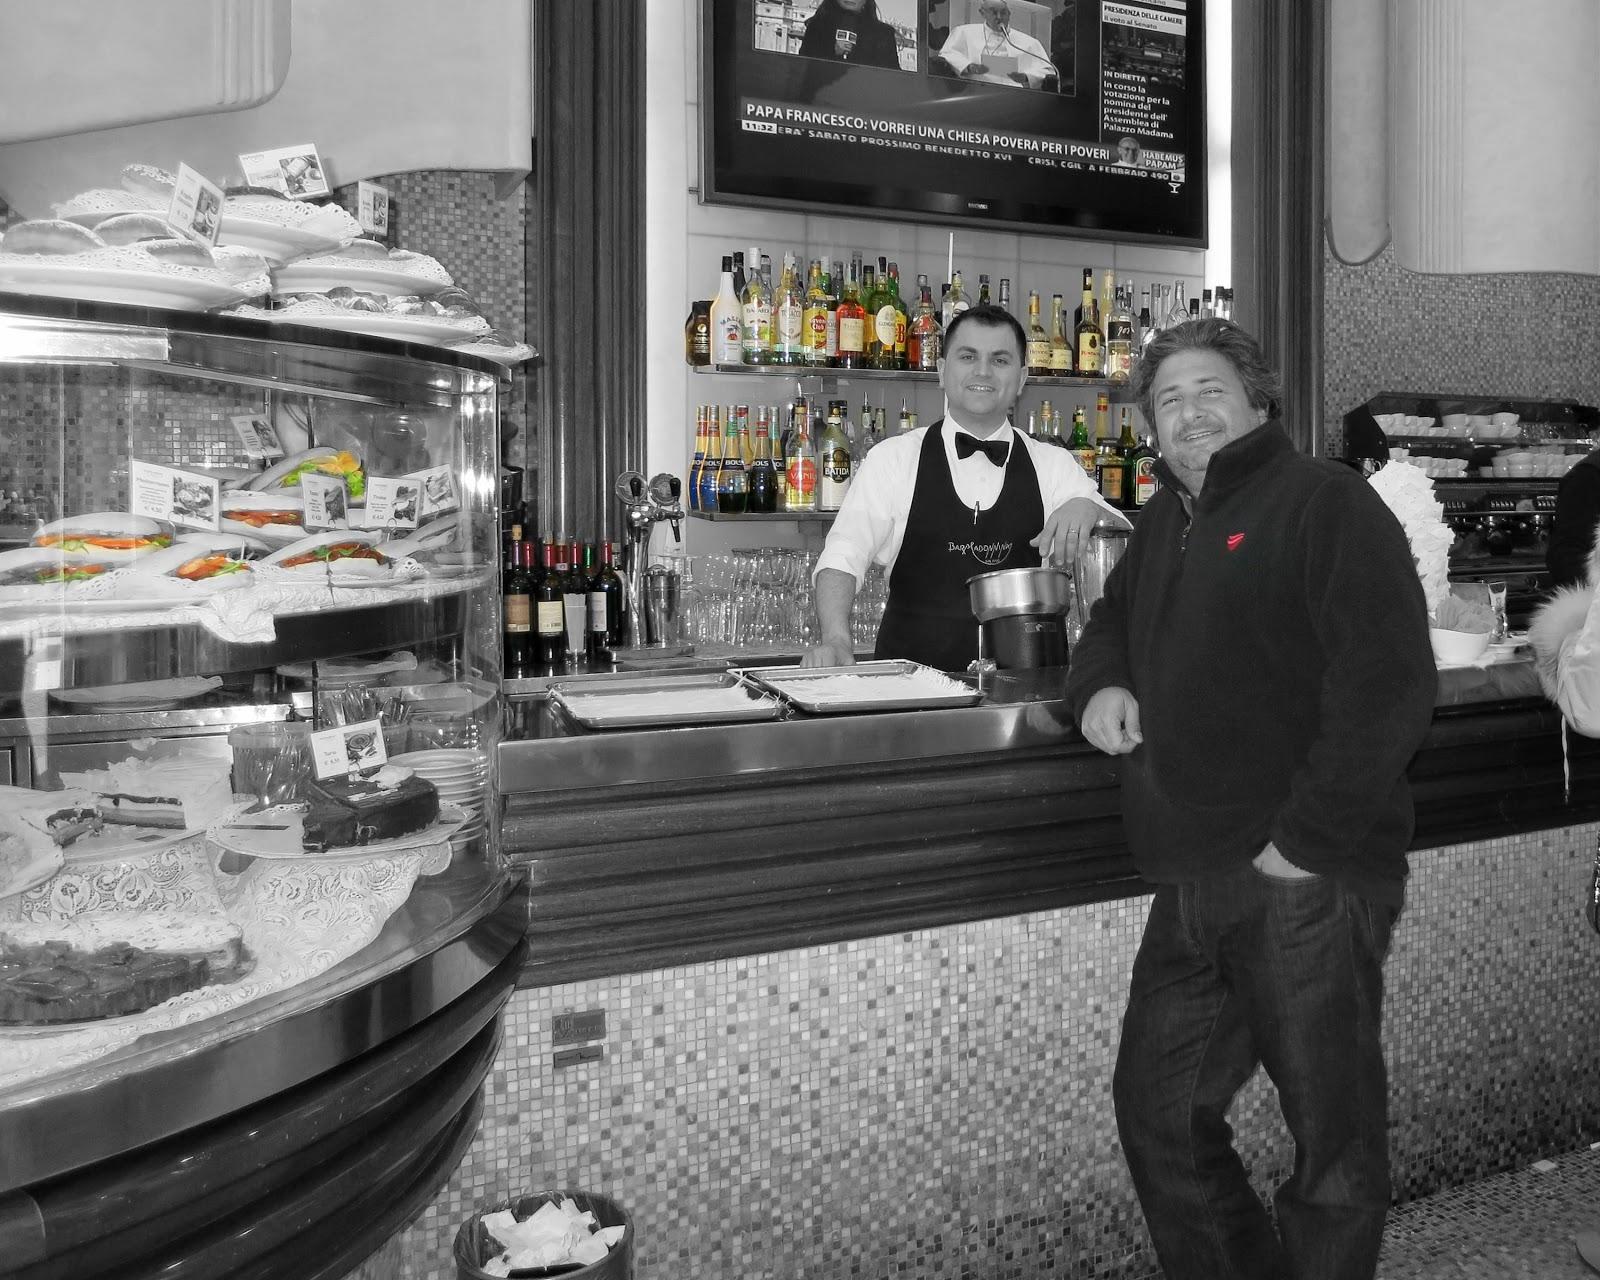 La opini n de mois s august 2012 for Bar madonnina milano